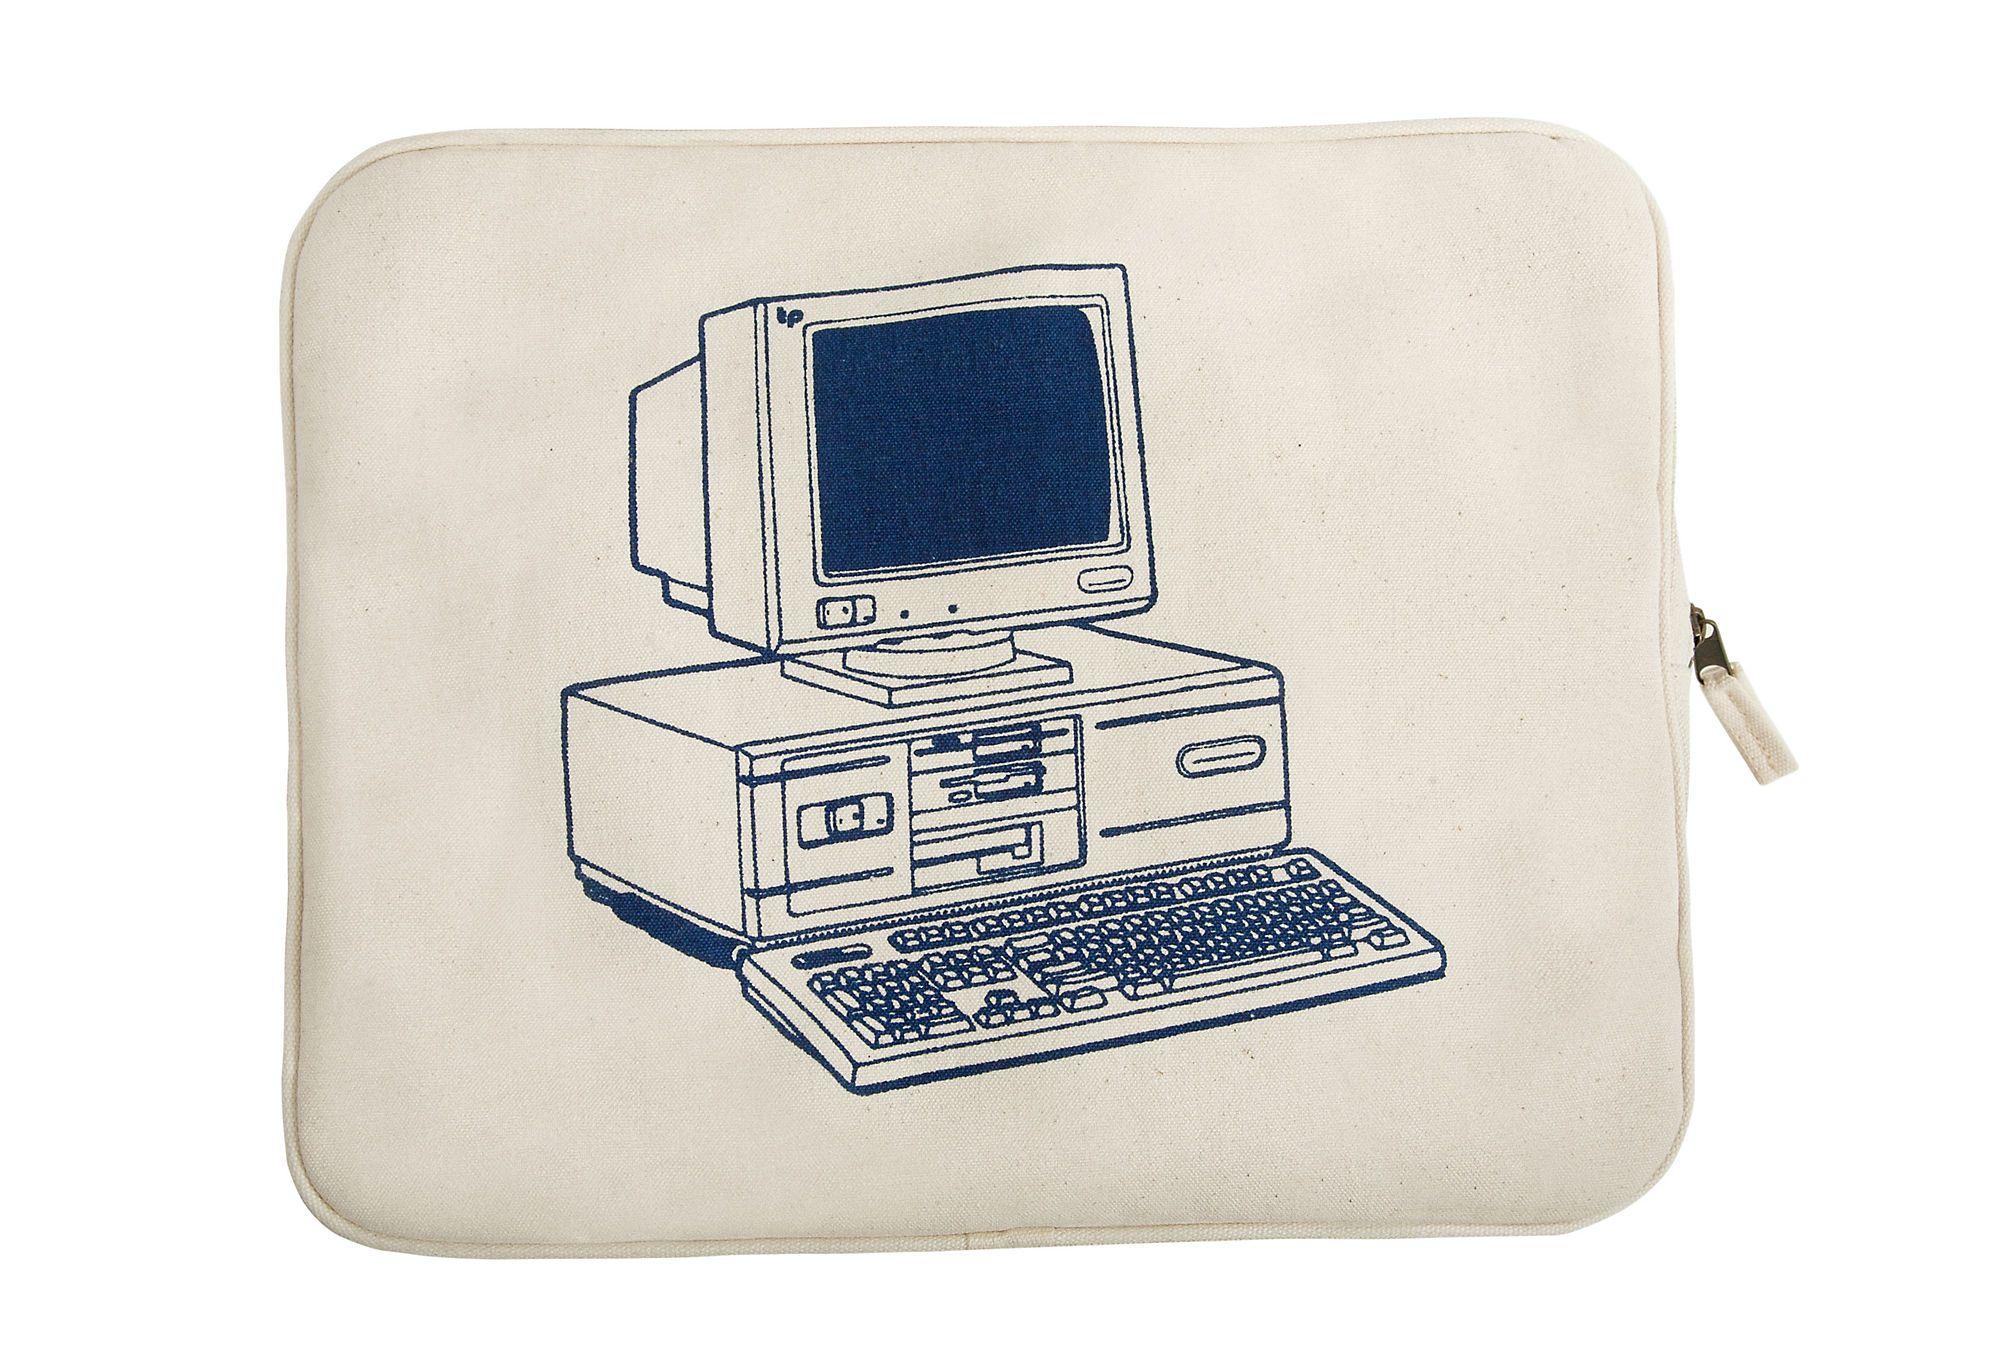 Retro laptop case